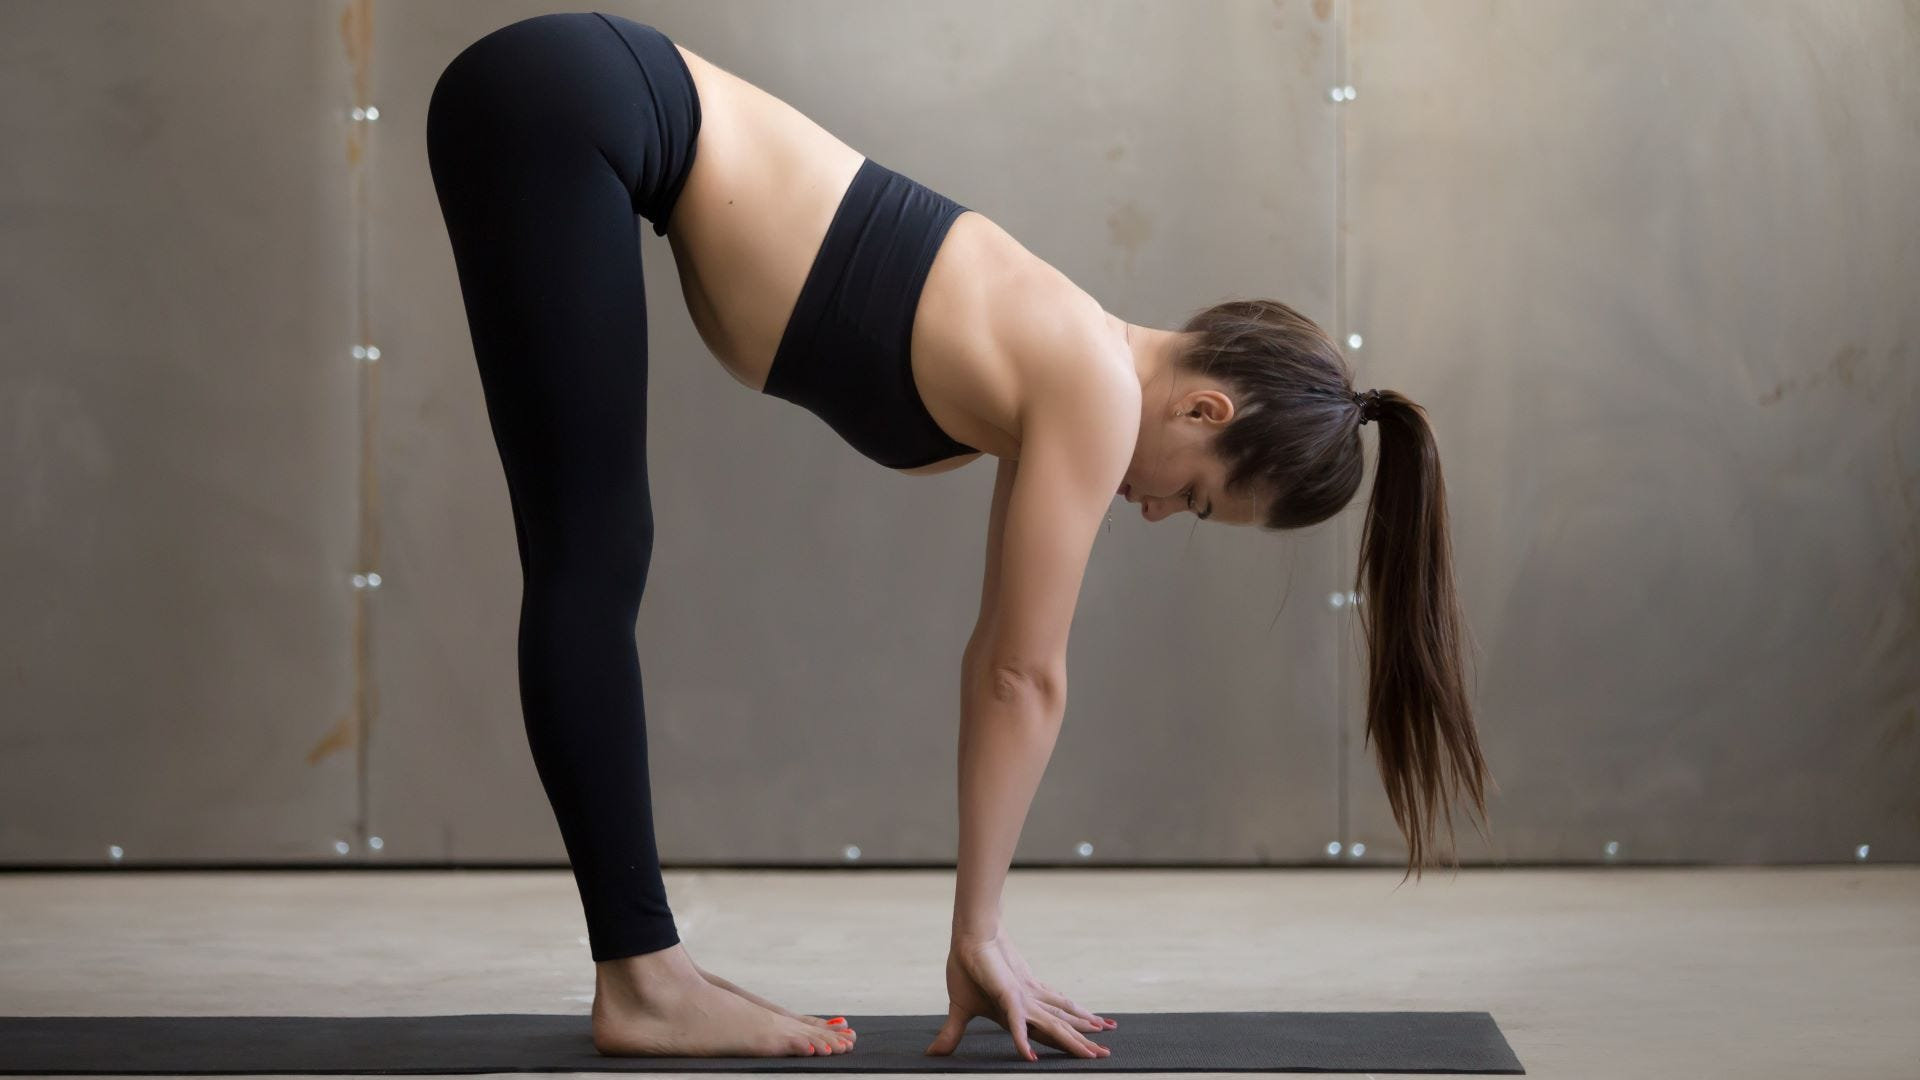 A woman doing a standing forward fold on a yoga mat.